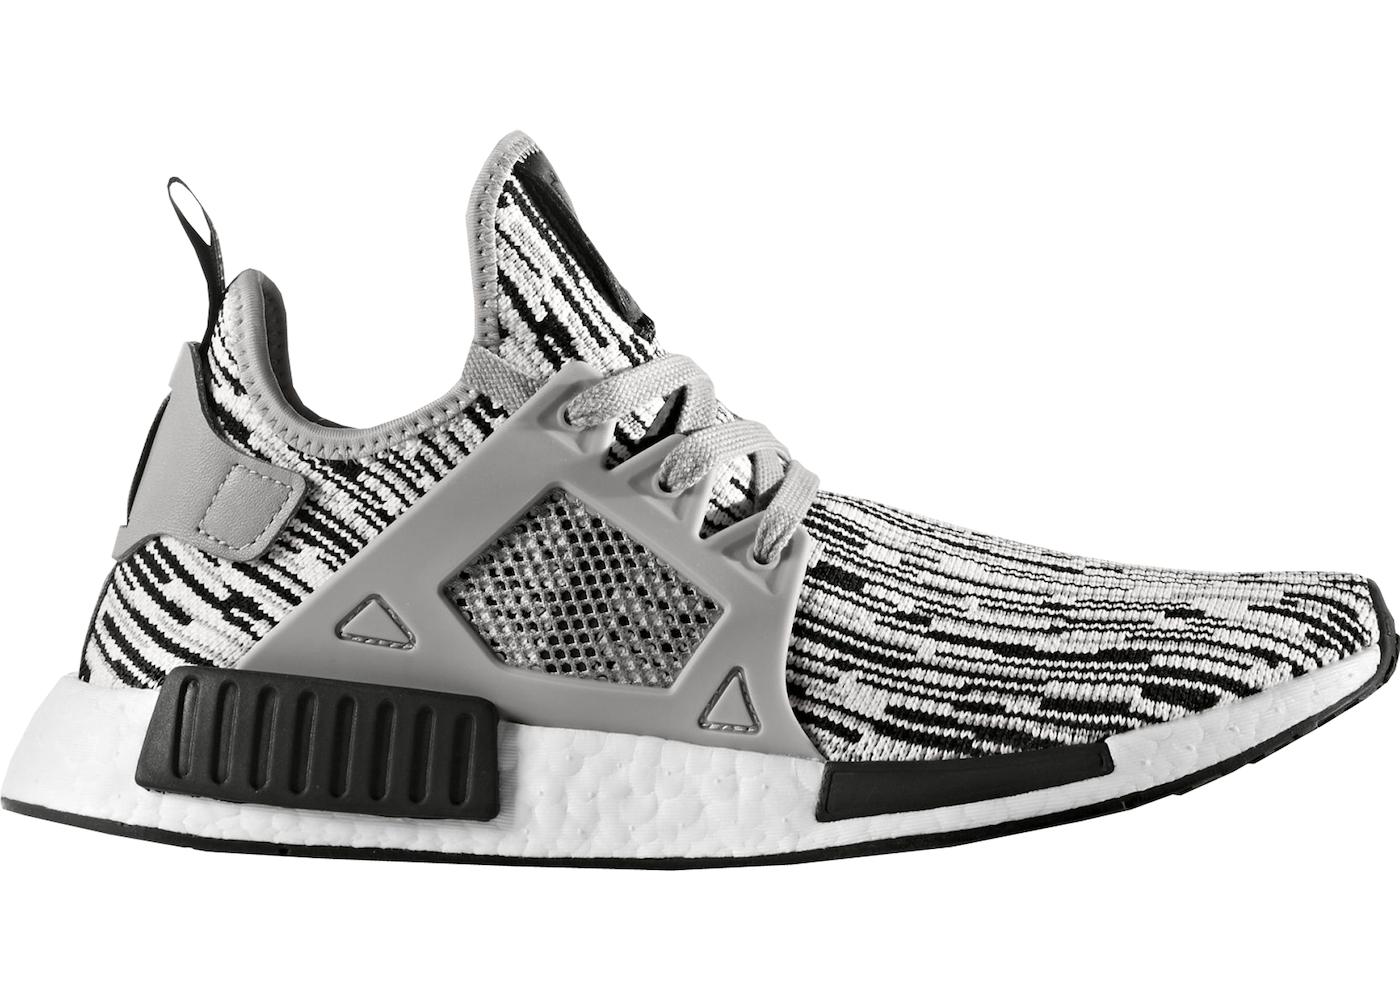 Adidas NMD_XR1 Primeknit Men's Shoes CBLUE/CBLACK S32212